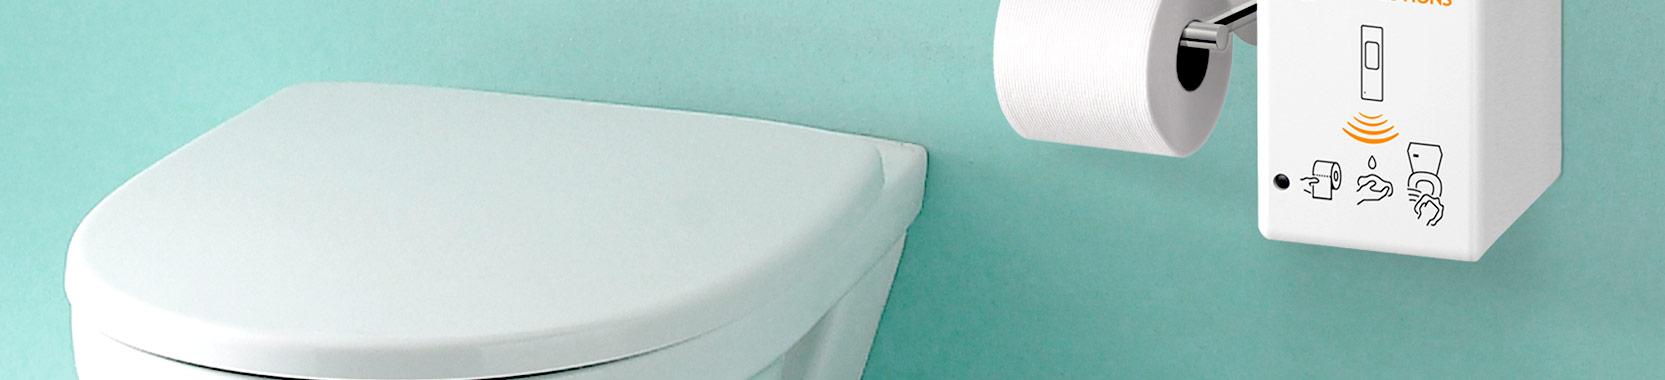 WC Sitz Desinfektionsmittelspender